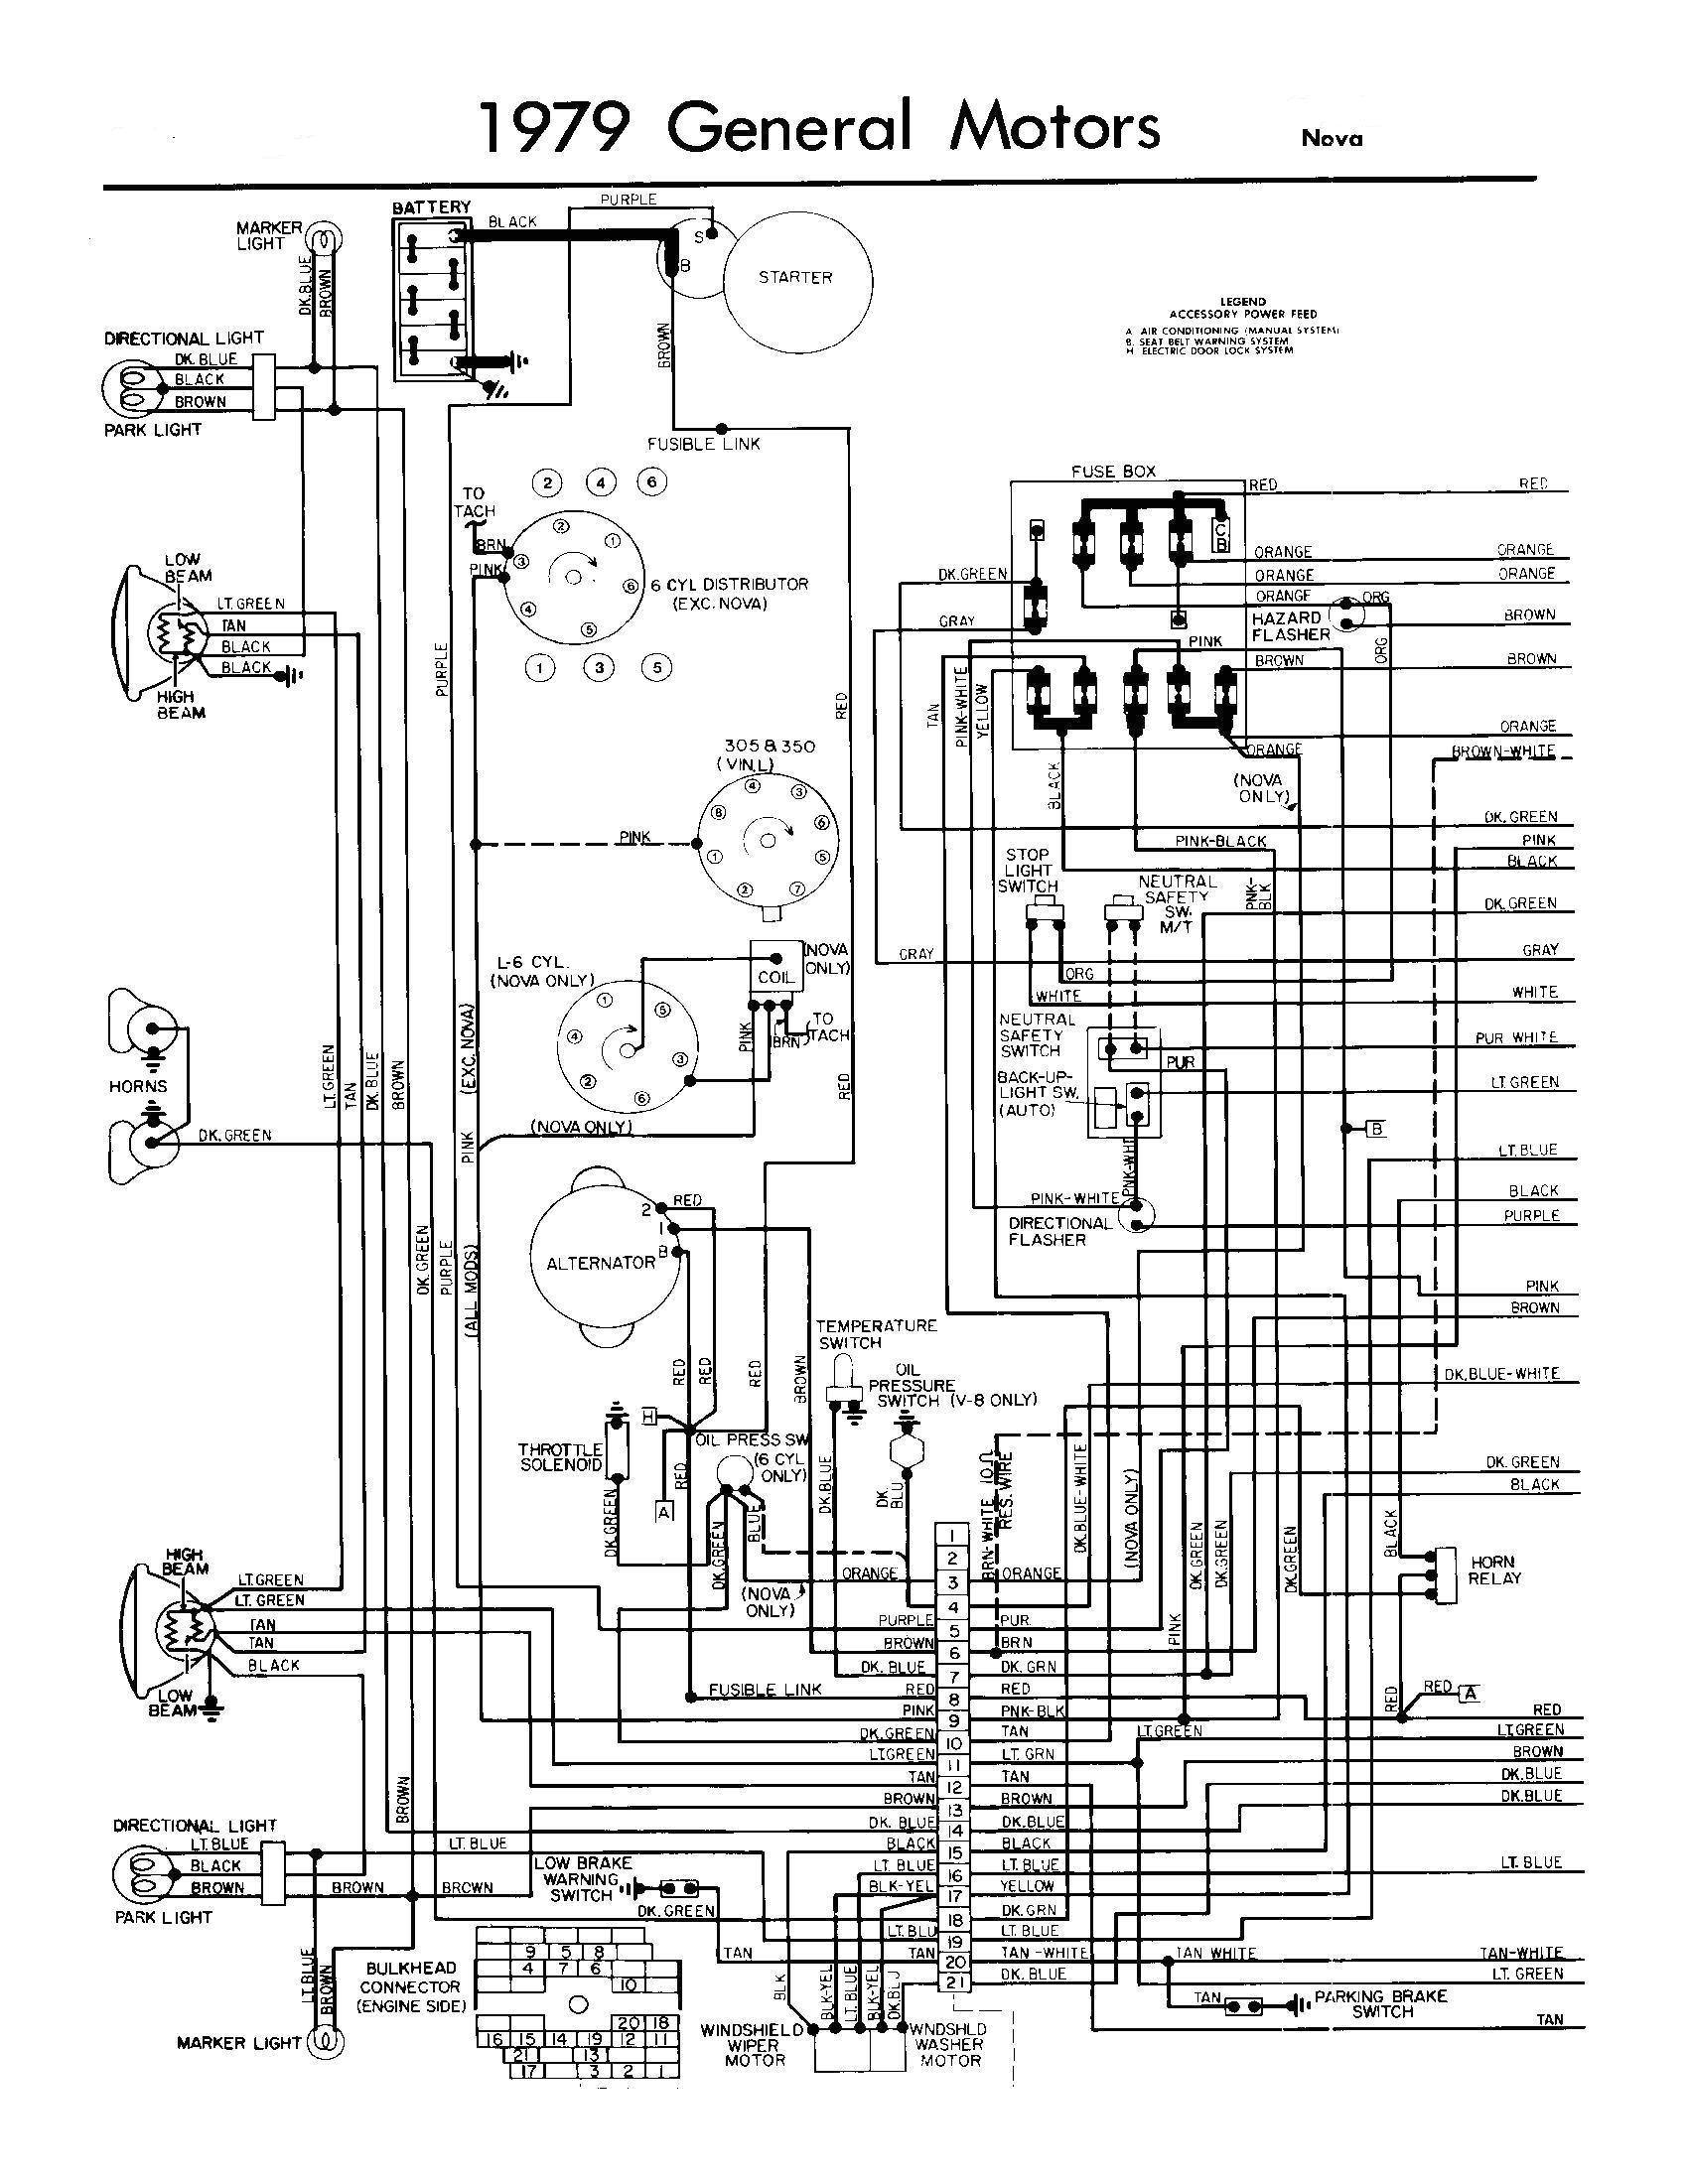 1984 El Camino Wiring Diagram 1975 Chevy Pickup Wiring Diagram Blog Wiring Diagram